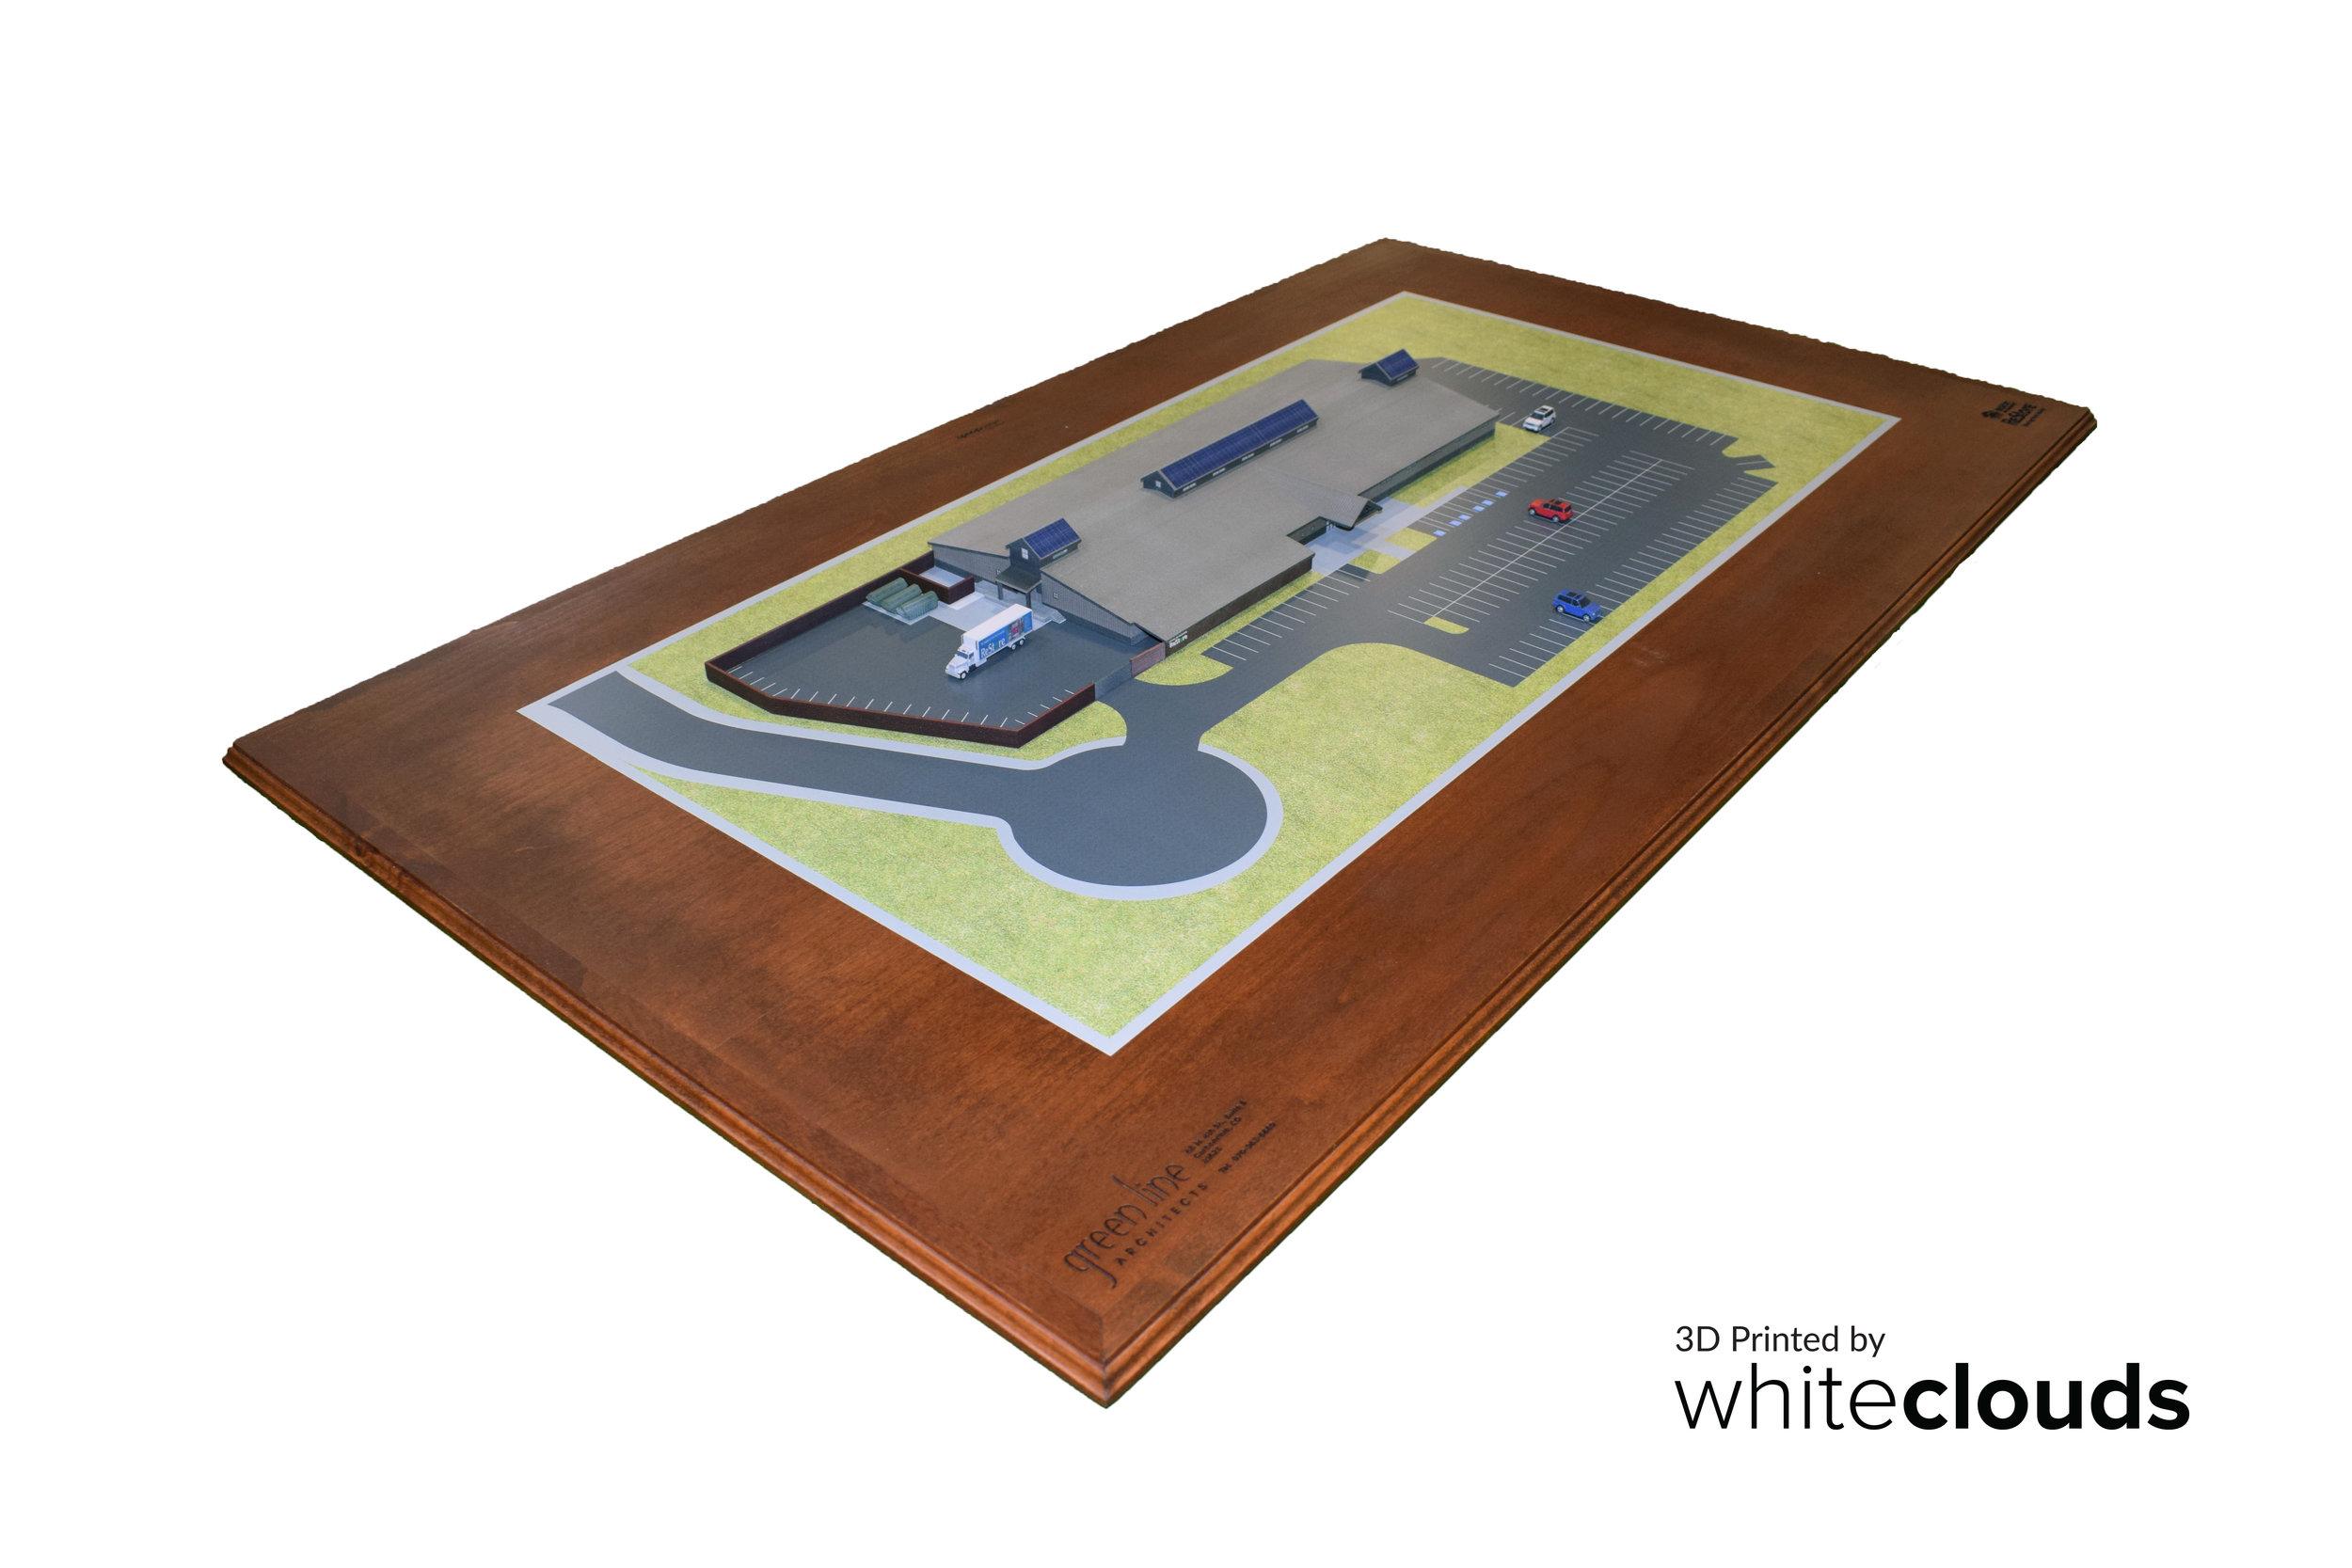 3D-Printed-WhiteClouds-Habitat4Humanity-Architectural-Habitat4Humanity-1.jpg